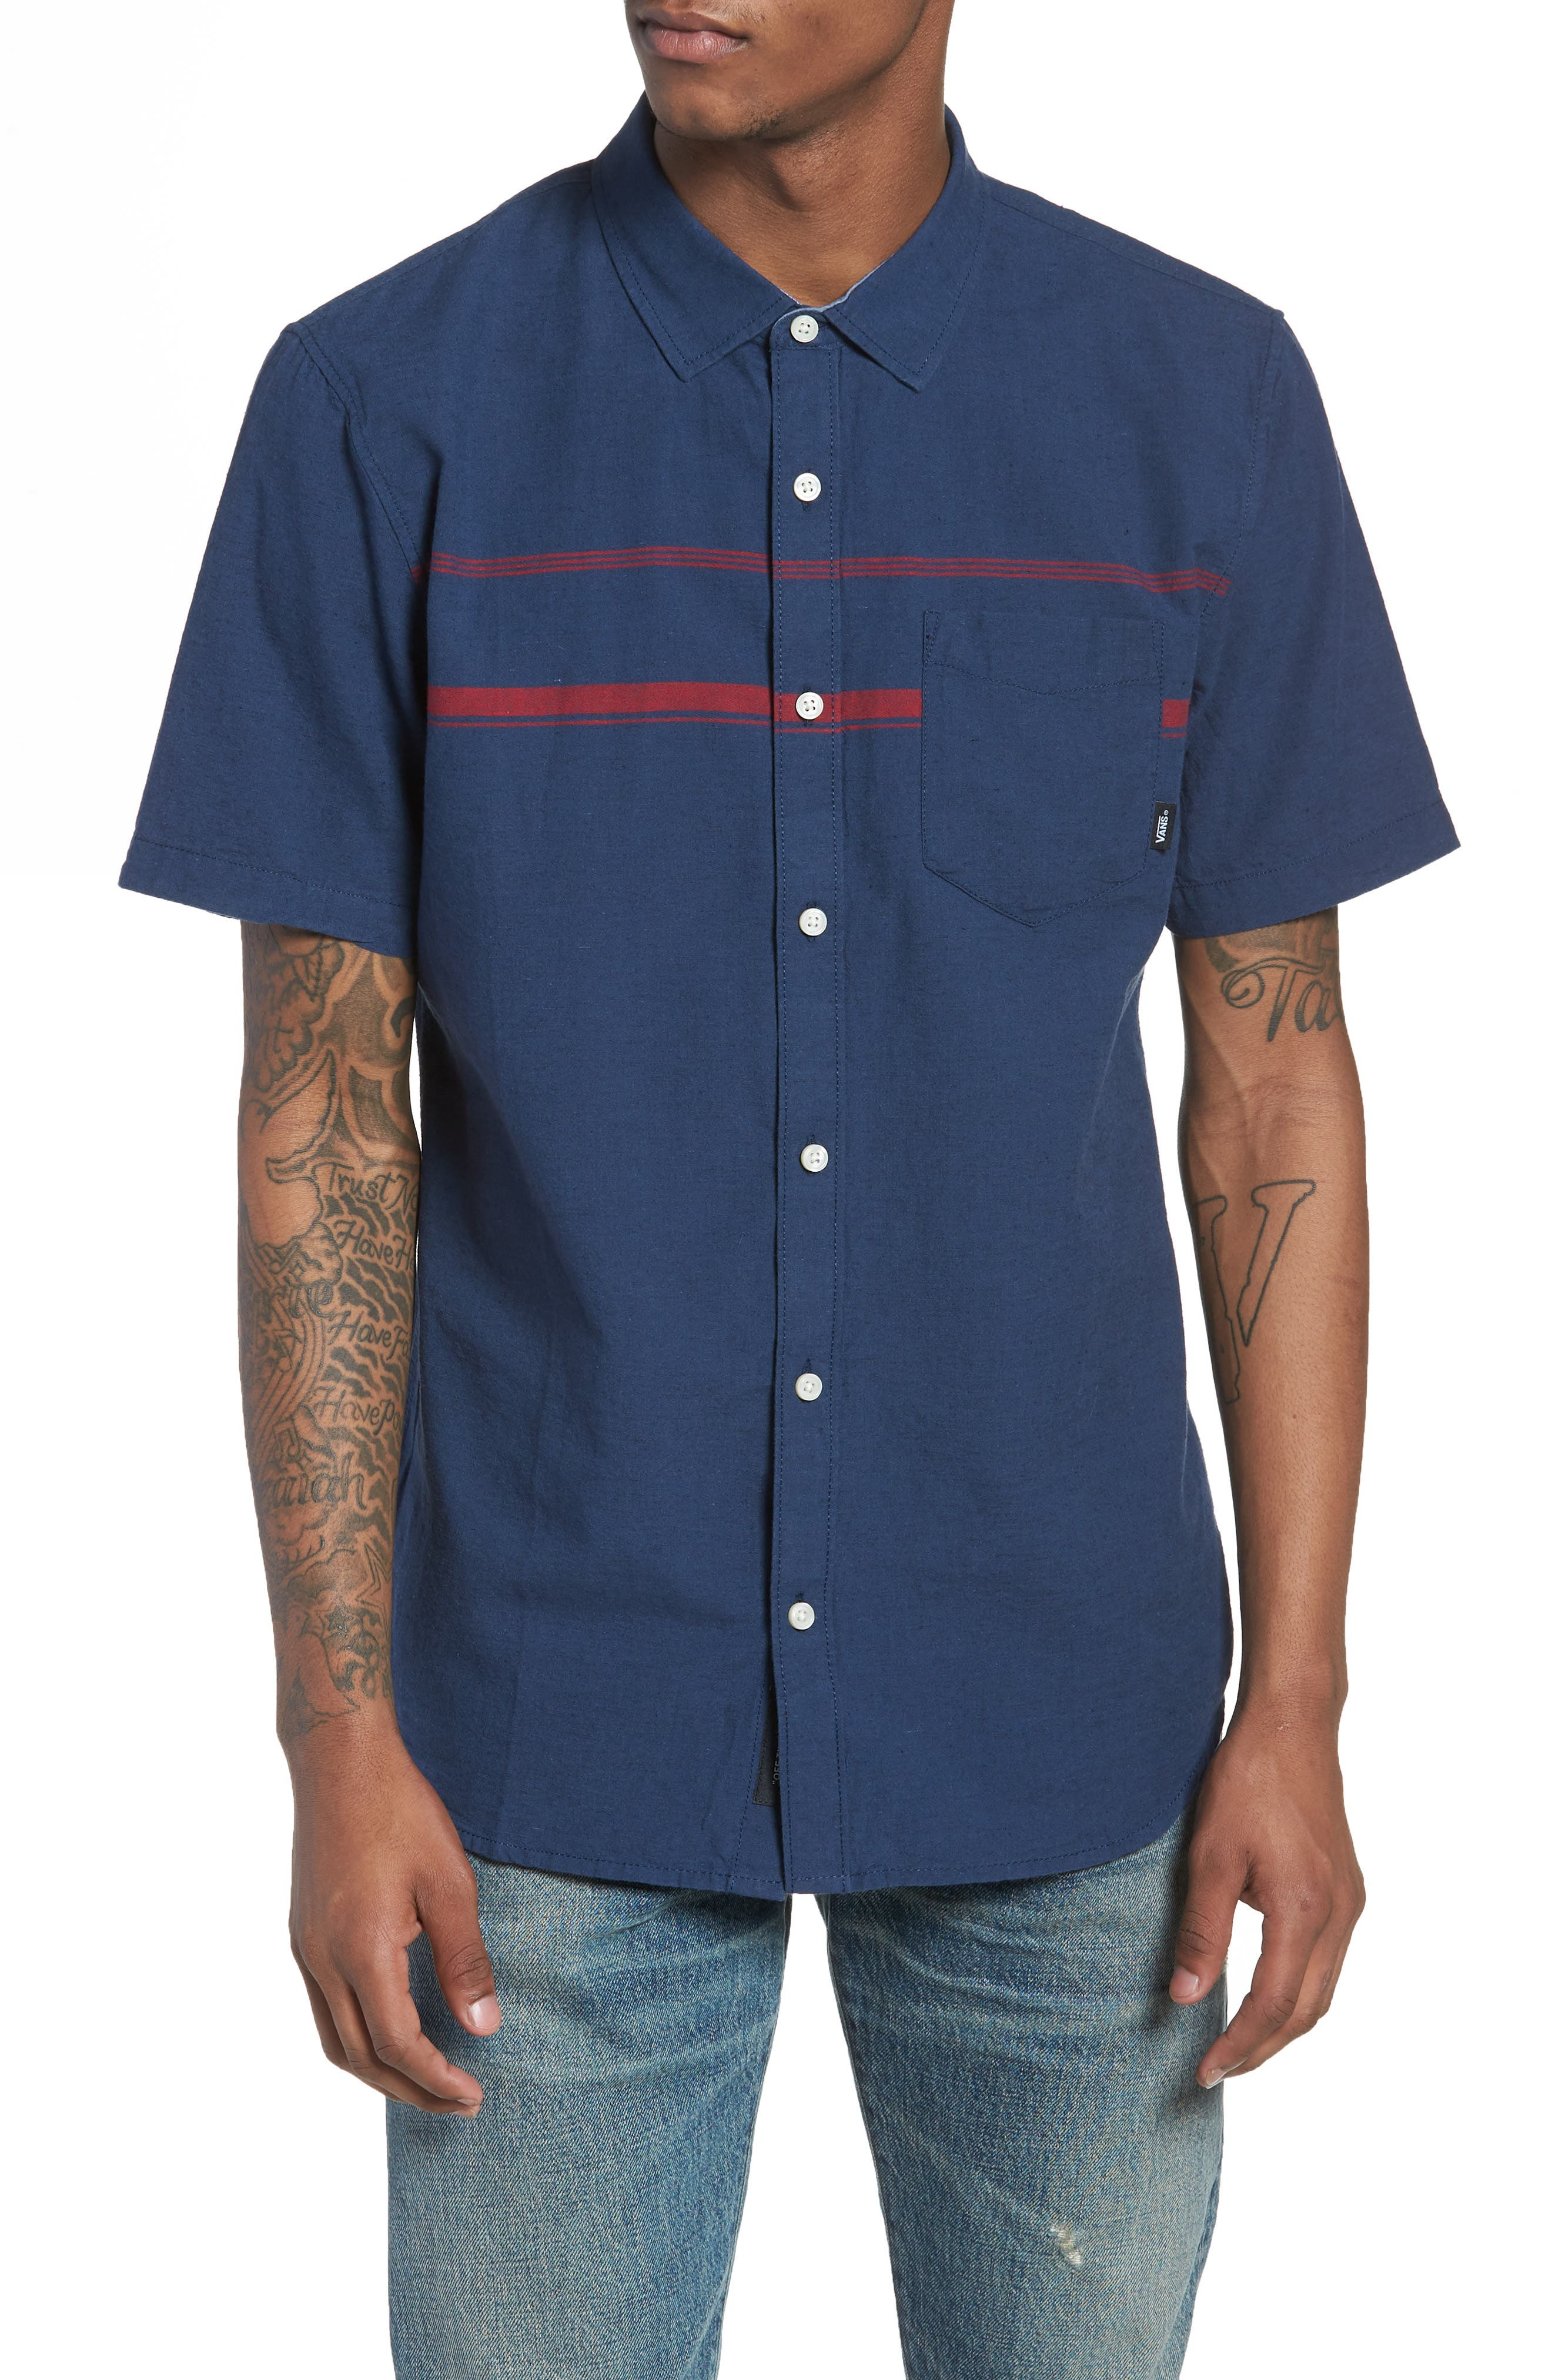 Thurber Short Sleeve Shirt,                         Main,                         color, 401